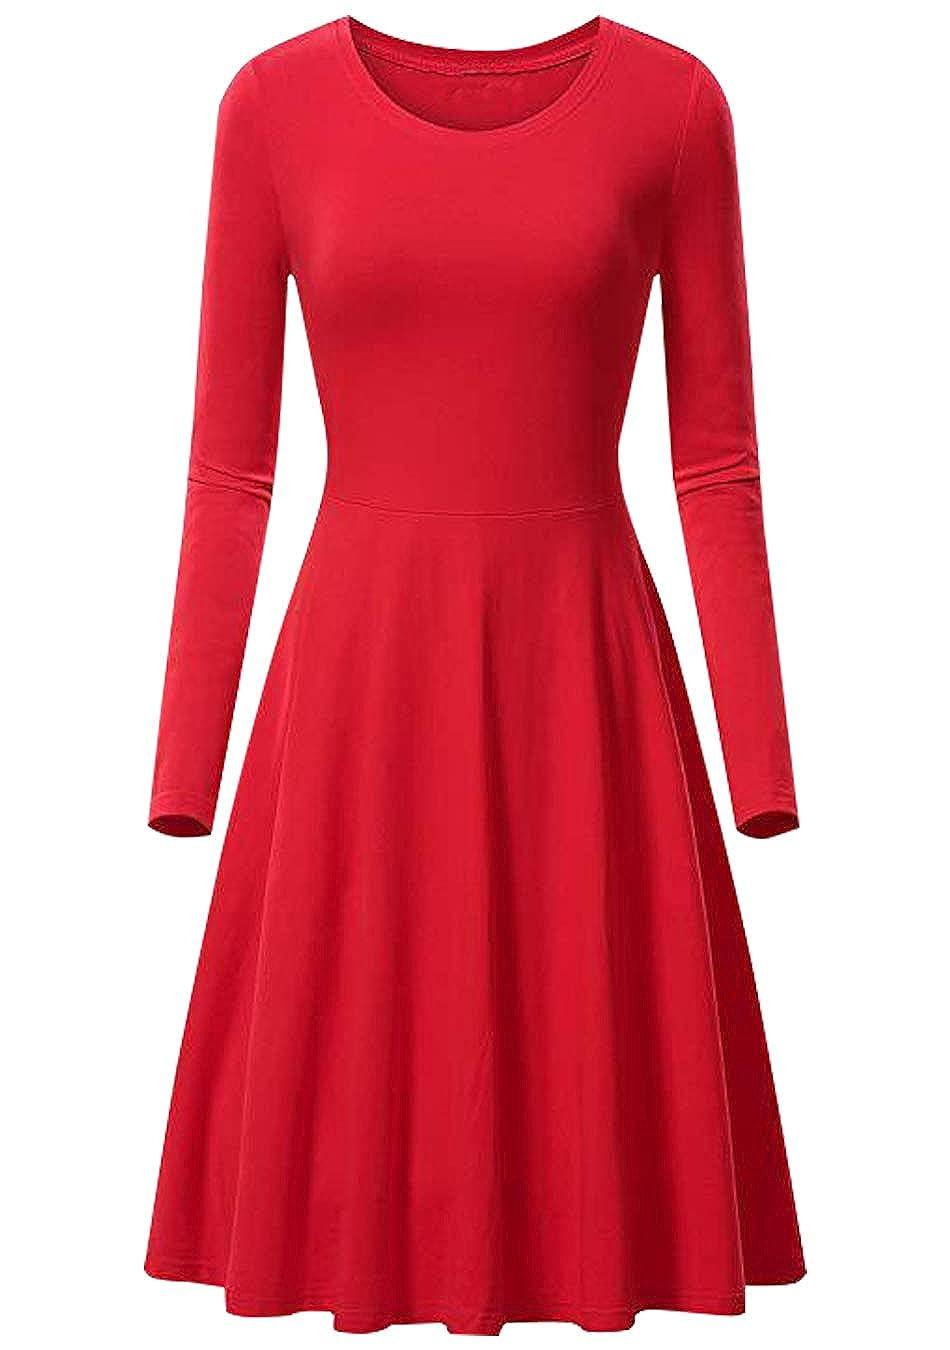 EFOFEI Womens Swing Round Neck Long Sleeve Midi A Line Solid Casual Elegant Slim Dress